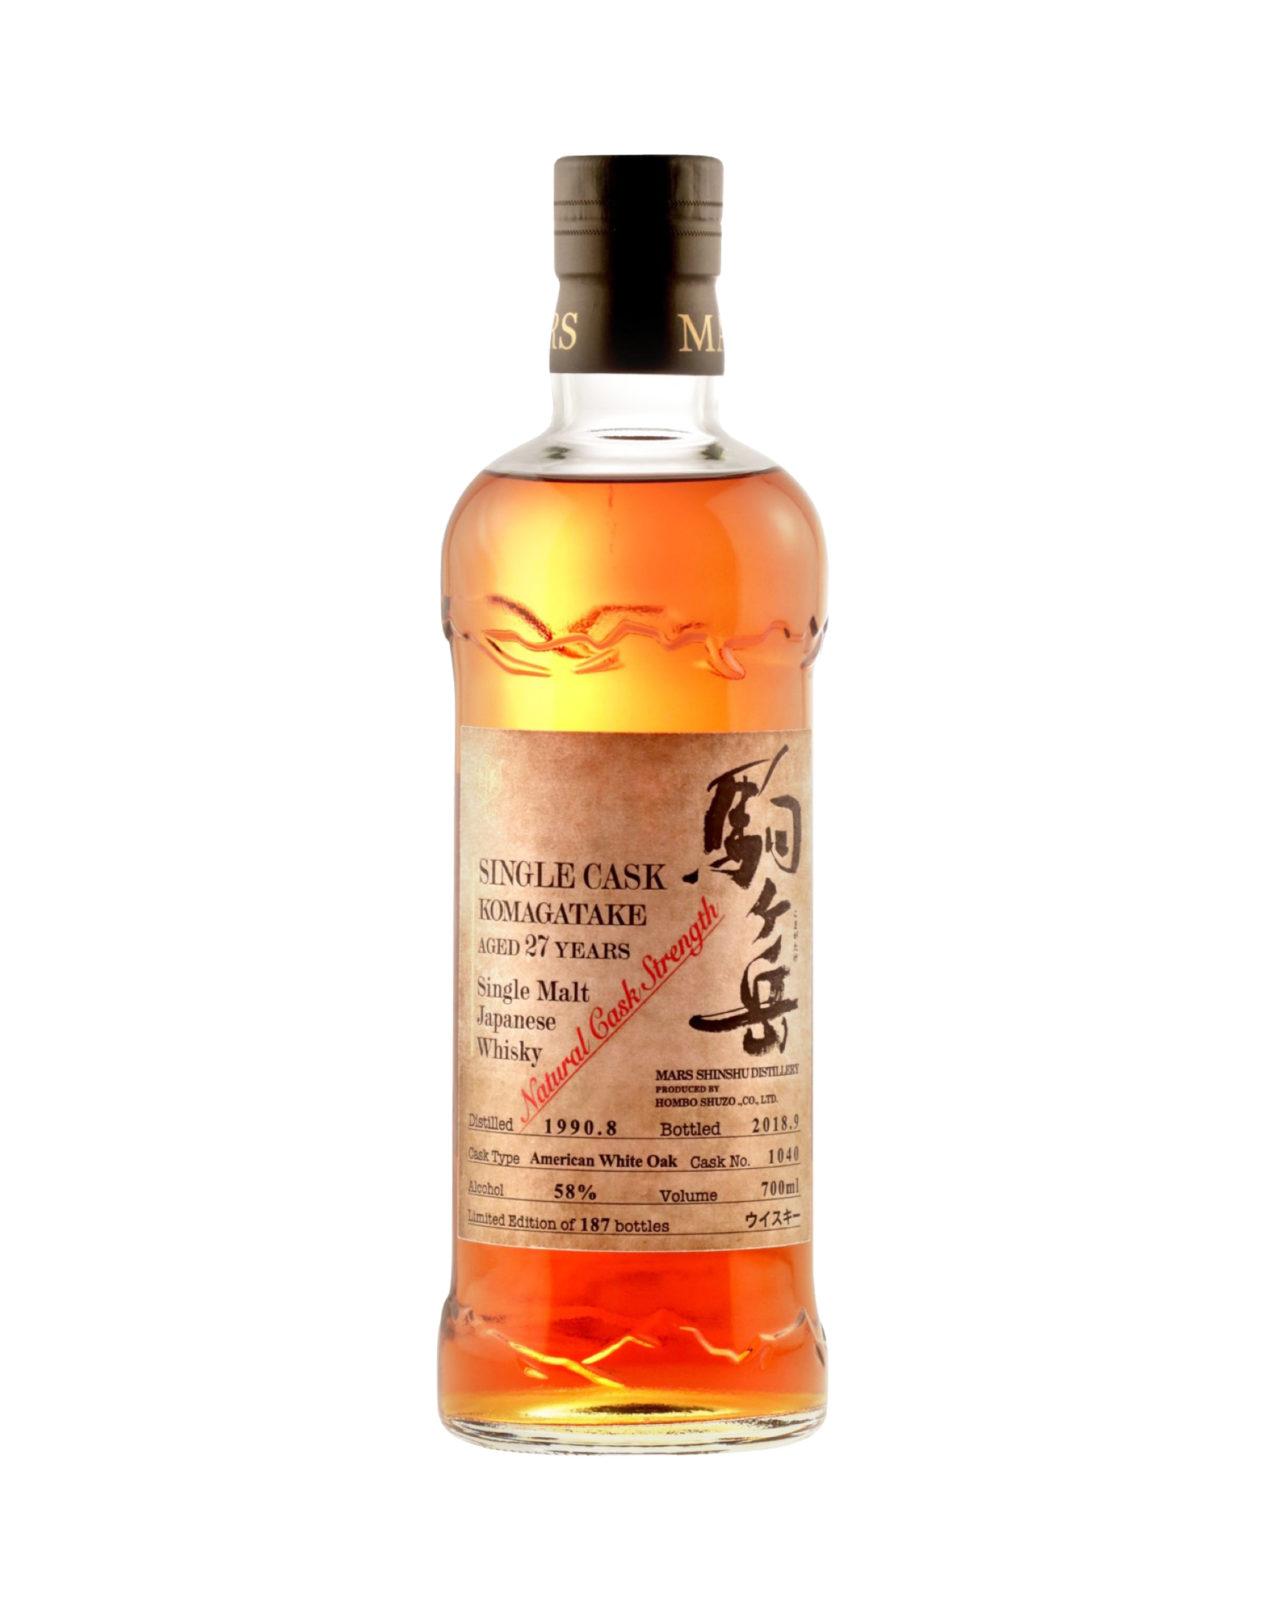 Mars Komagatake Single Cask Single Malt 1040 Japanese Whisky